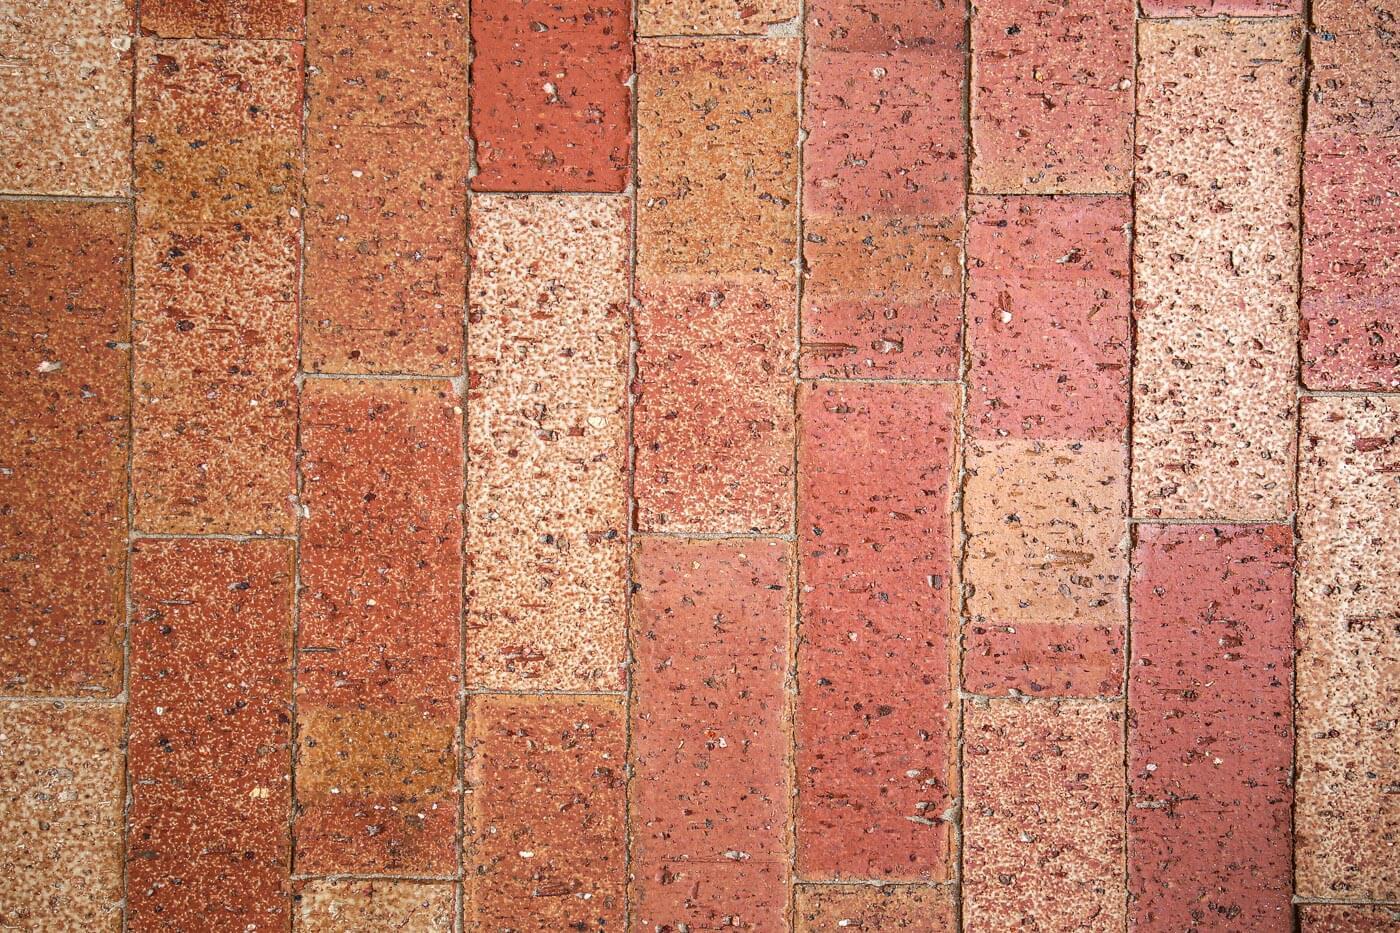 Stardust Rouge Paver 230mm X 76mm X 62mm Littlehampton Bricks And Pavers Rs 16 1